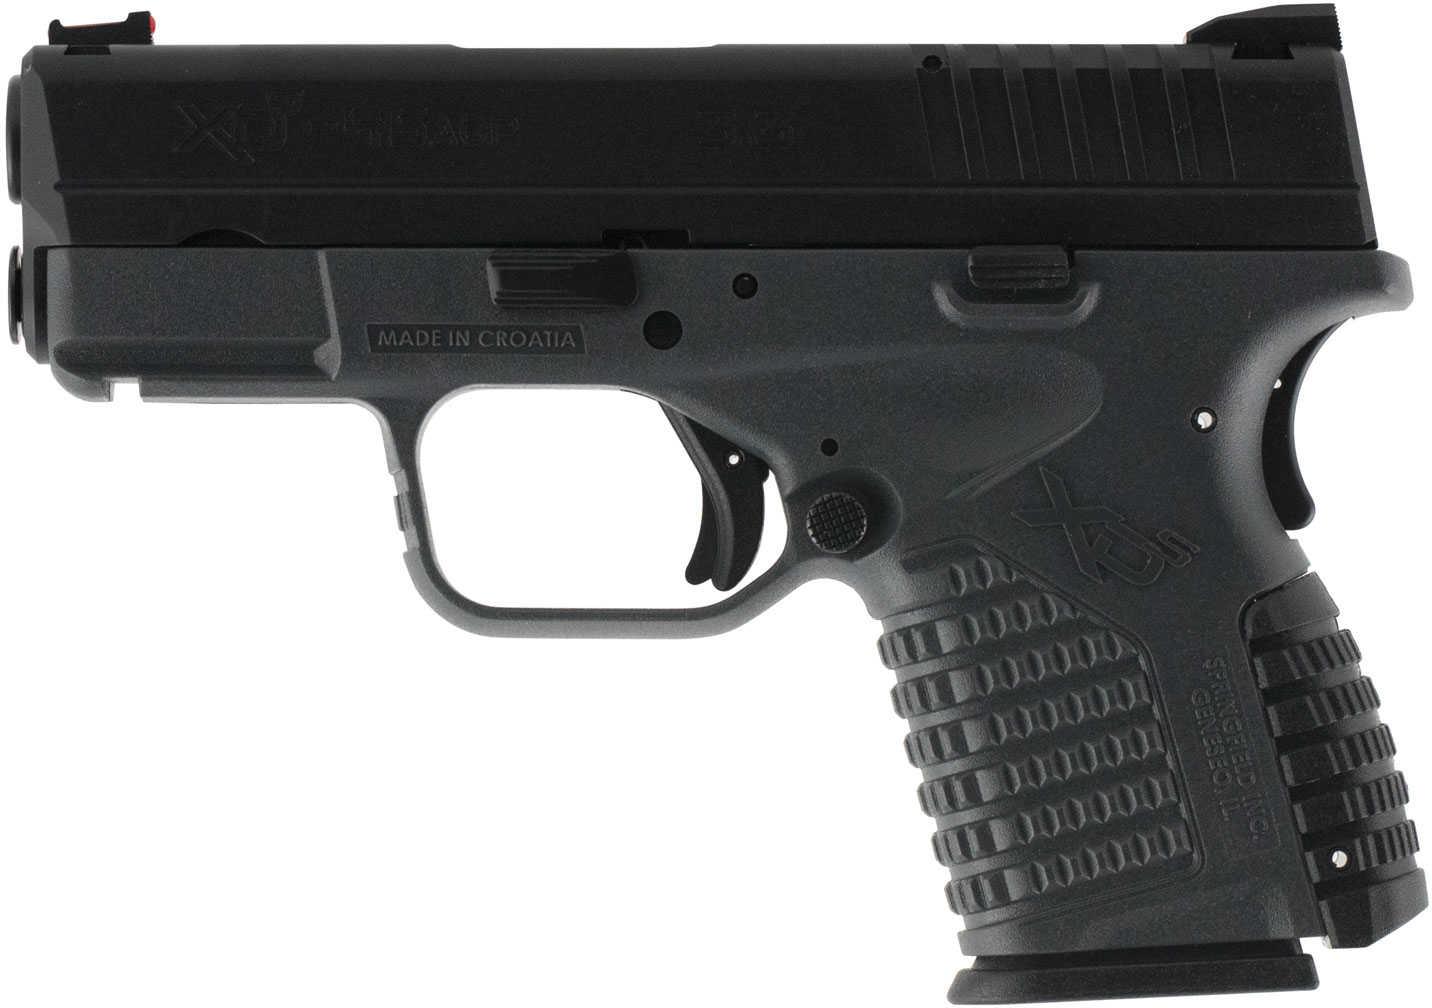 "Springfield Xds Pistol 45 ACP 3.3"" Barrel Gray (1) Magazine"